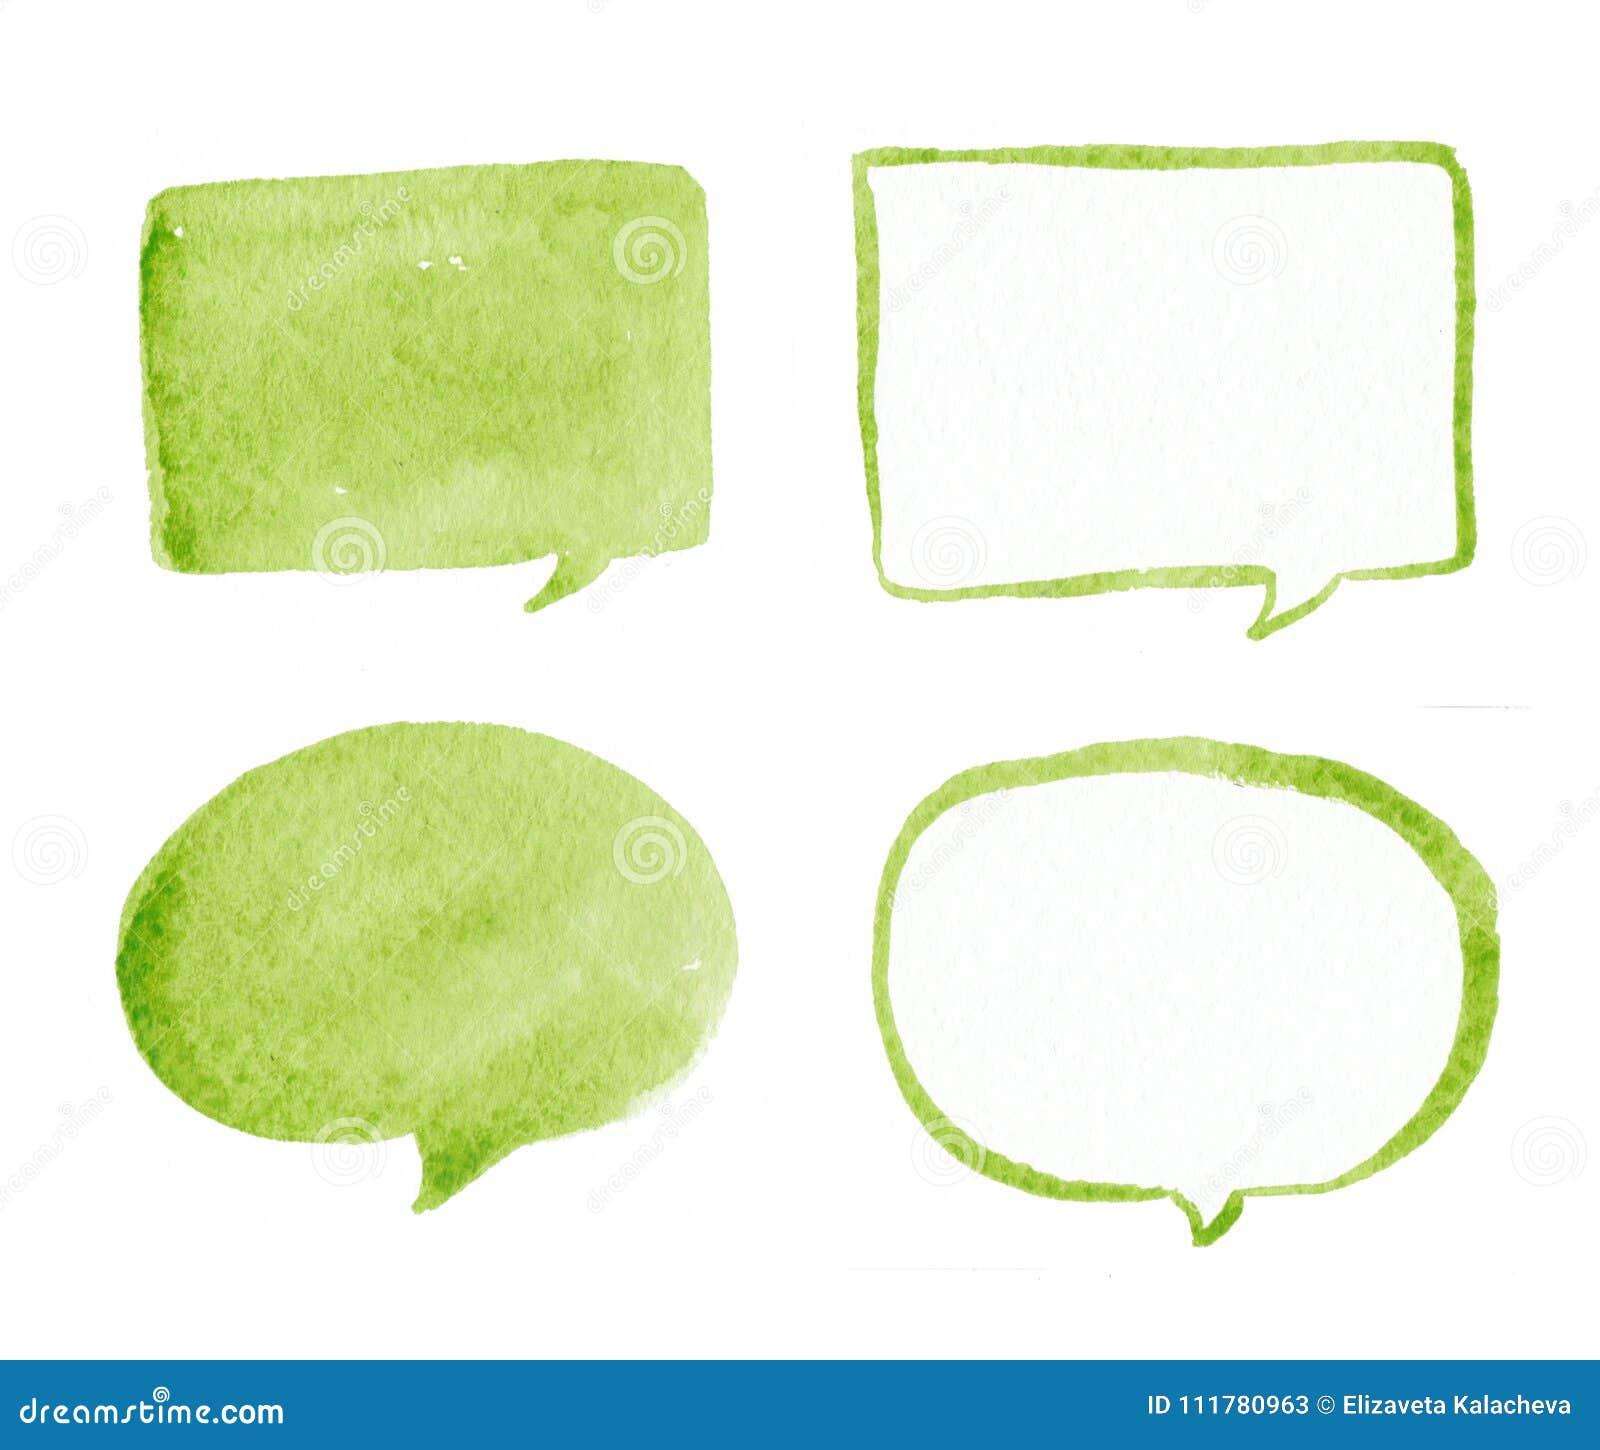 Hand drawn green bubble speech watercolor set, bubble watercolor. Green bubble